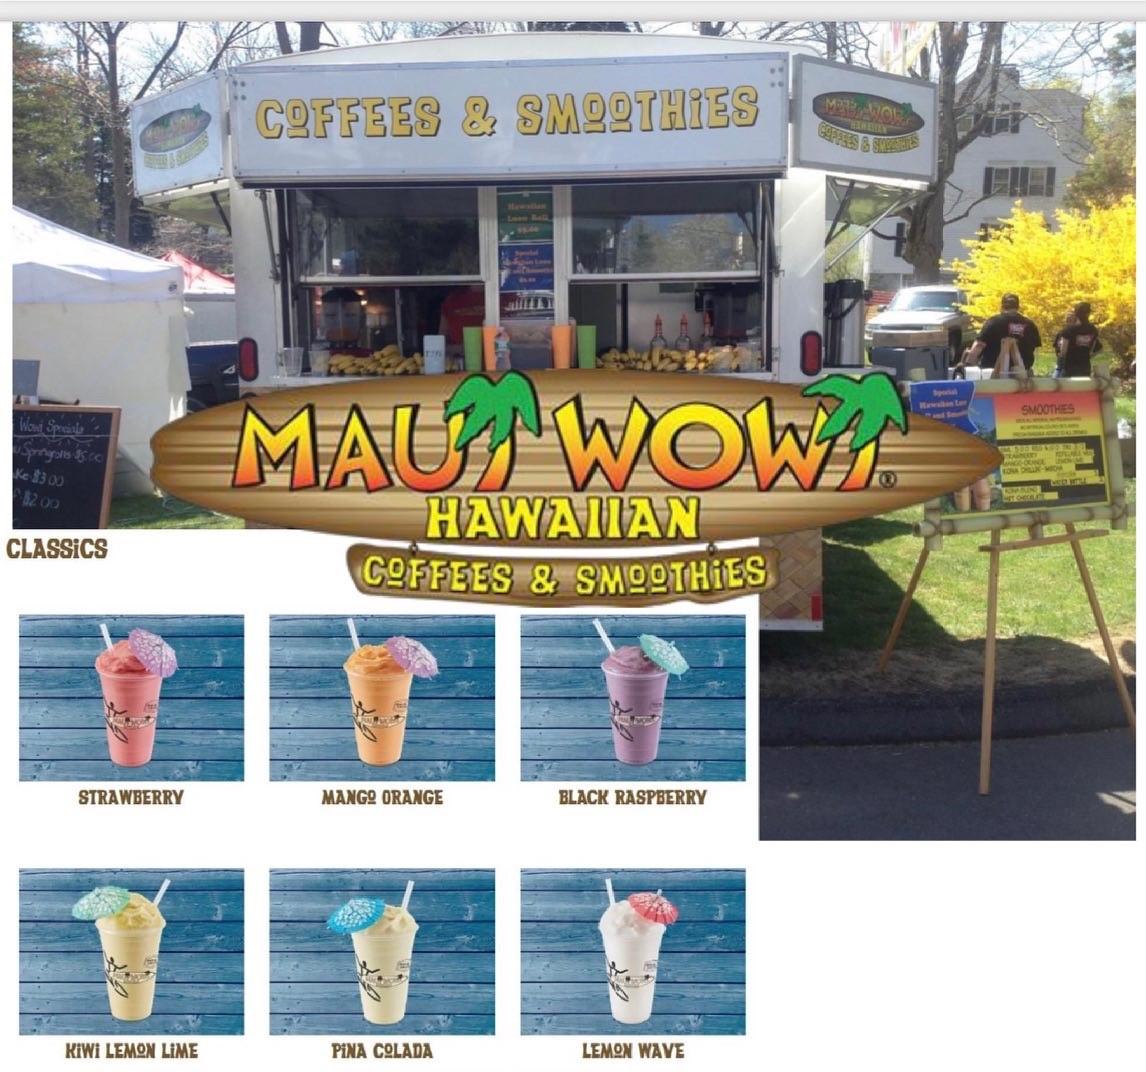 Maui Wowi Truck menu